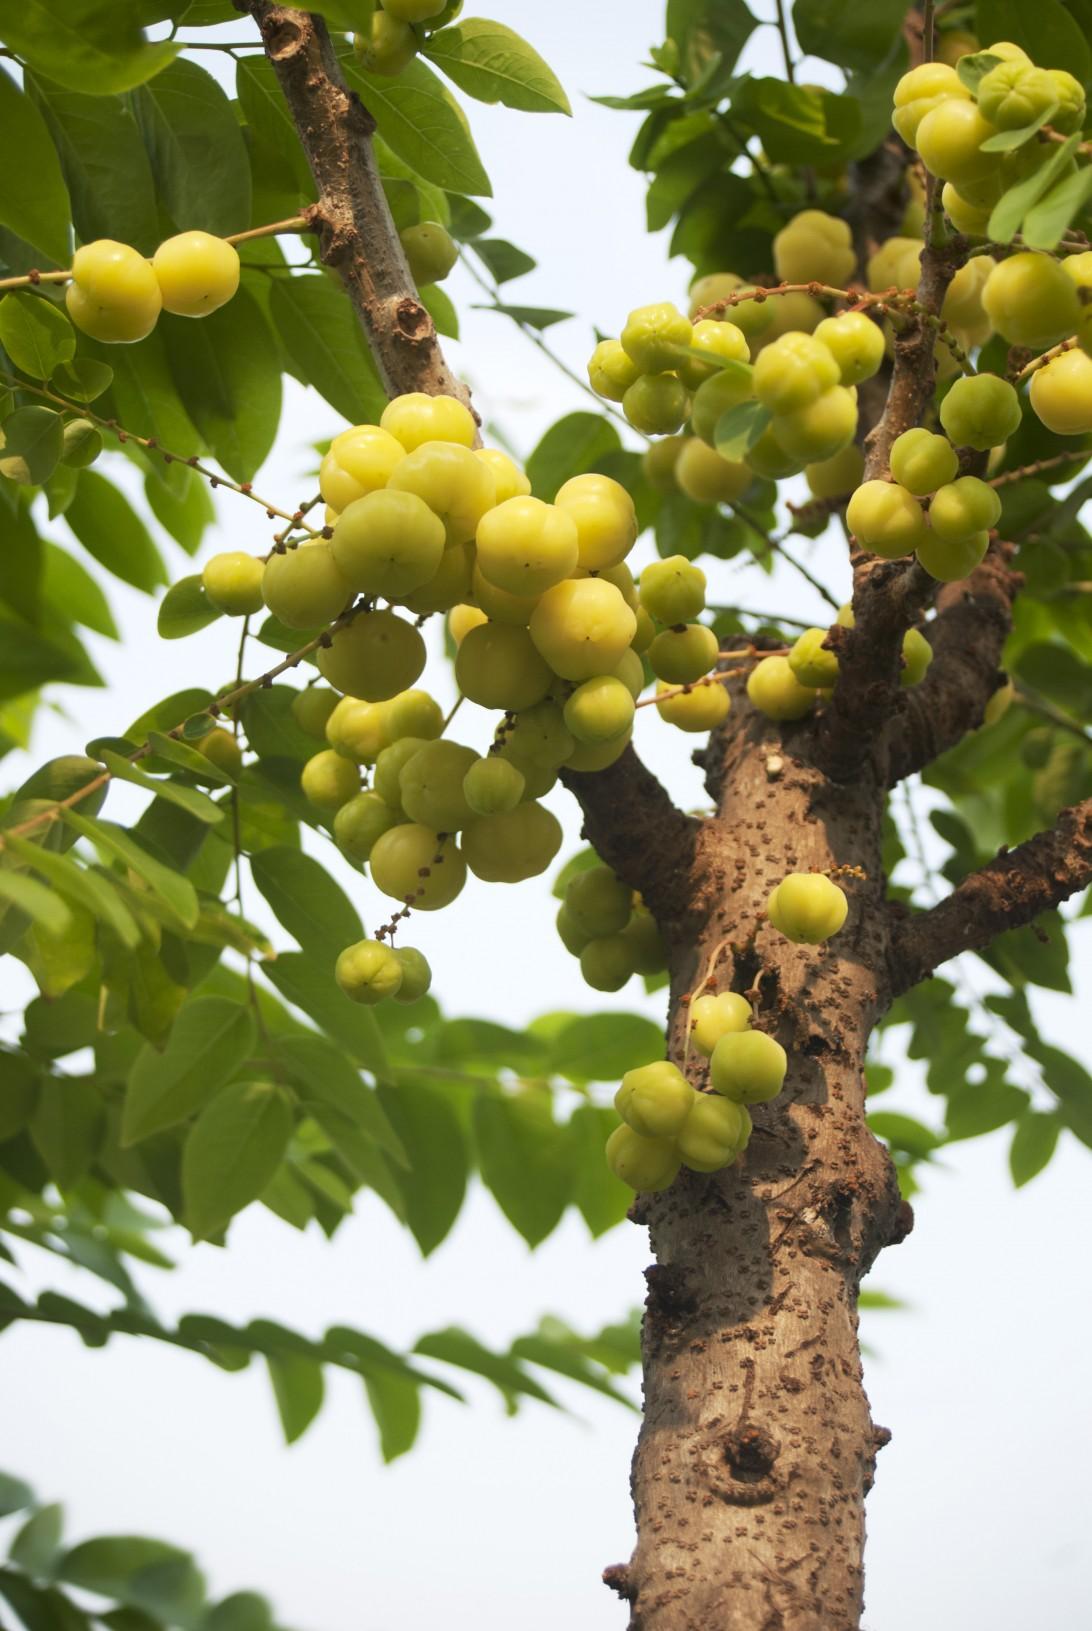 My Sunday Photo: Grandma's Fruits Farm - Star Gooseberry